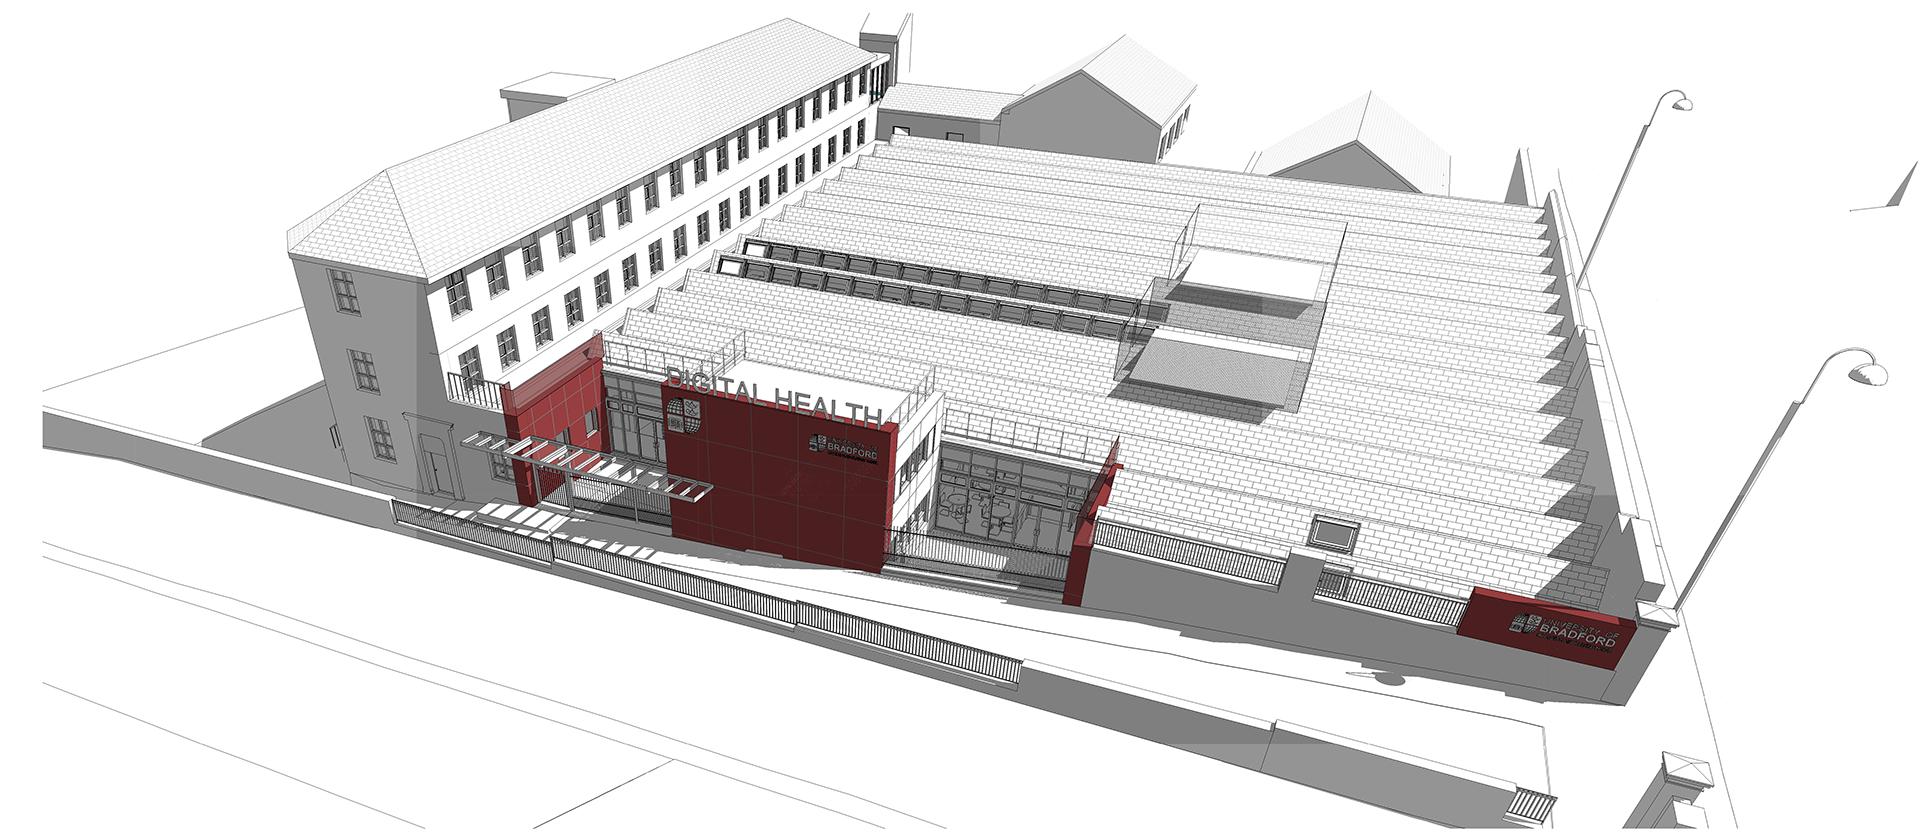 Digital Health Enterprise Zone Academic Building – Bradford